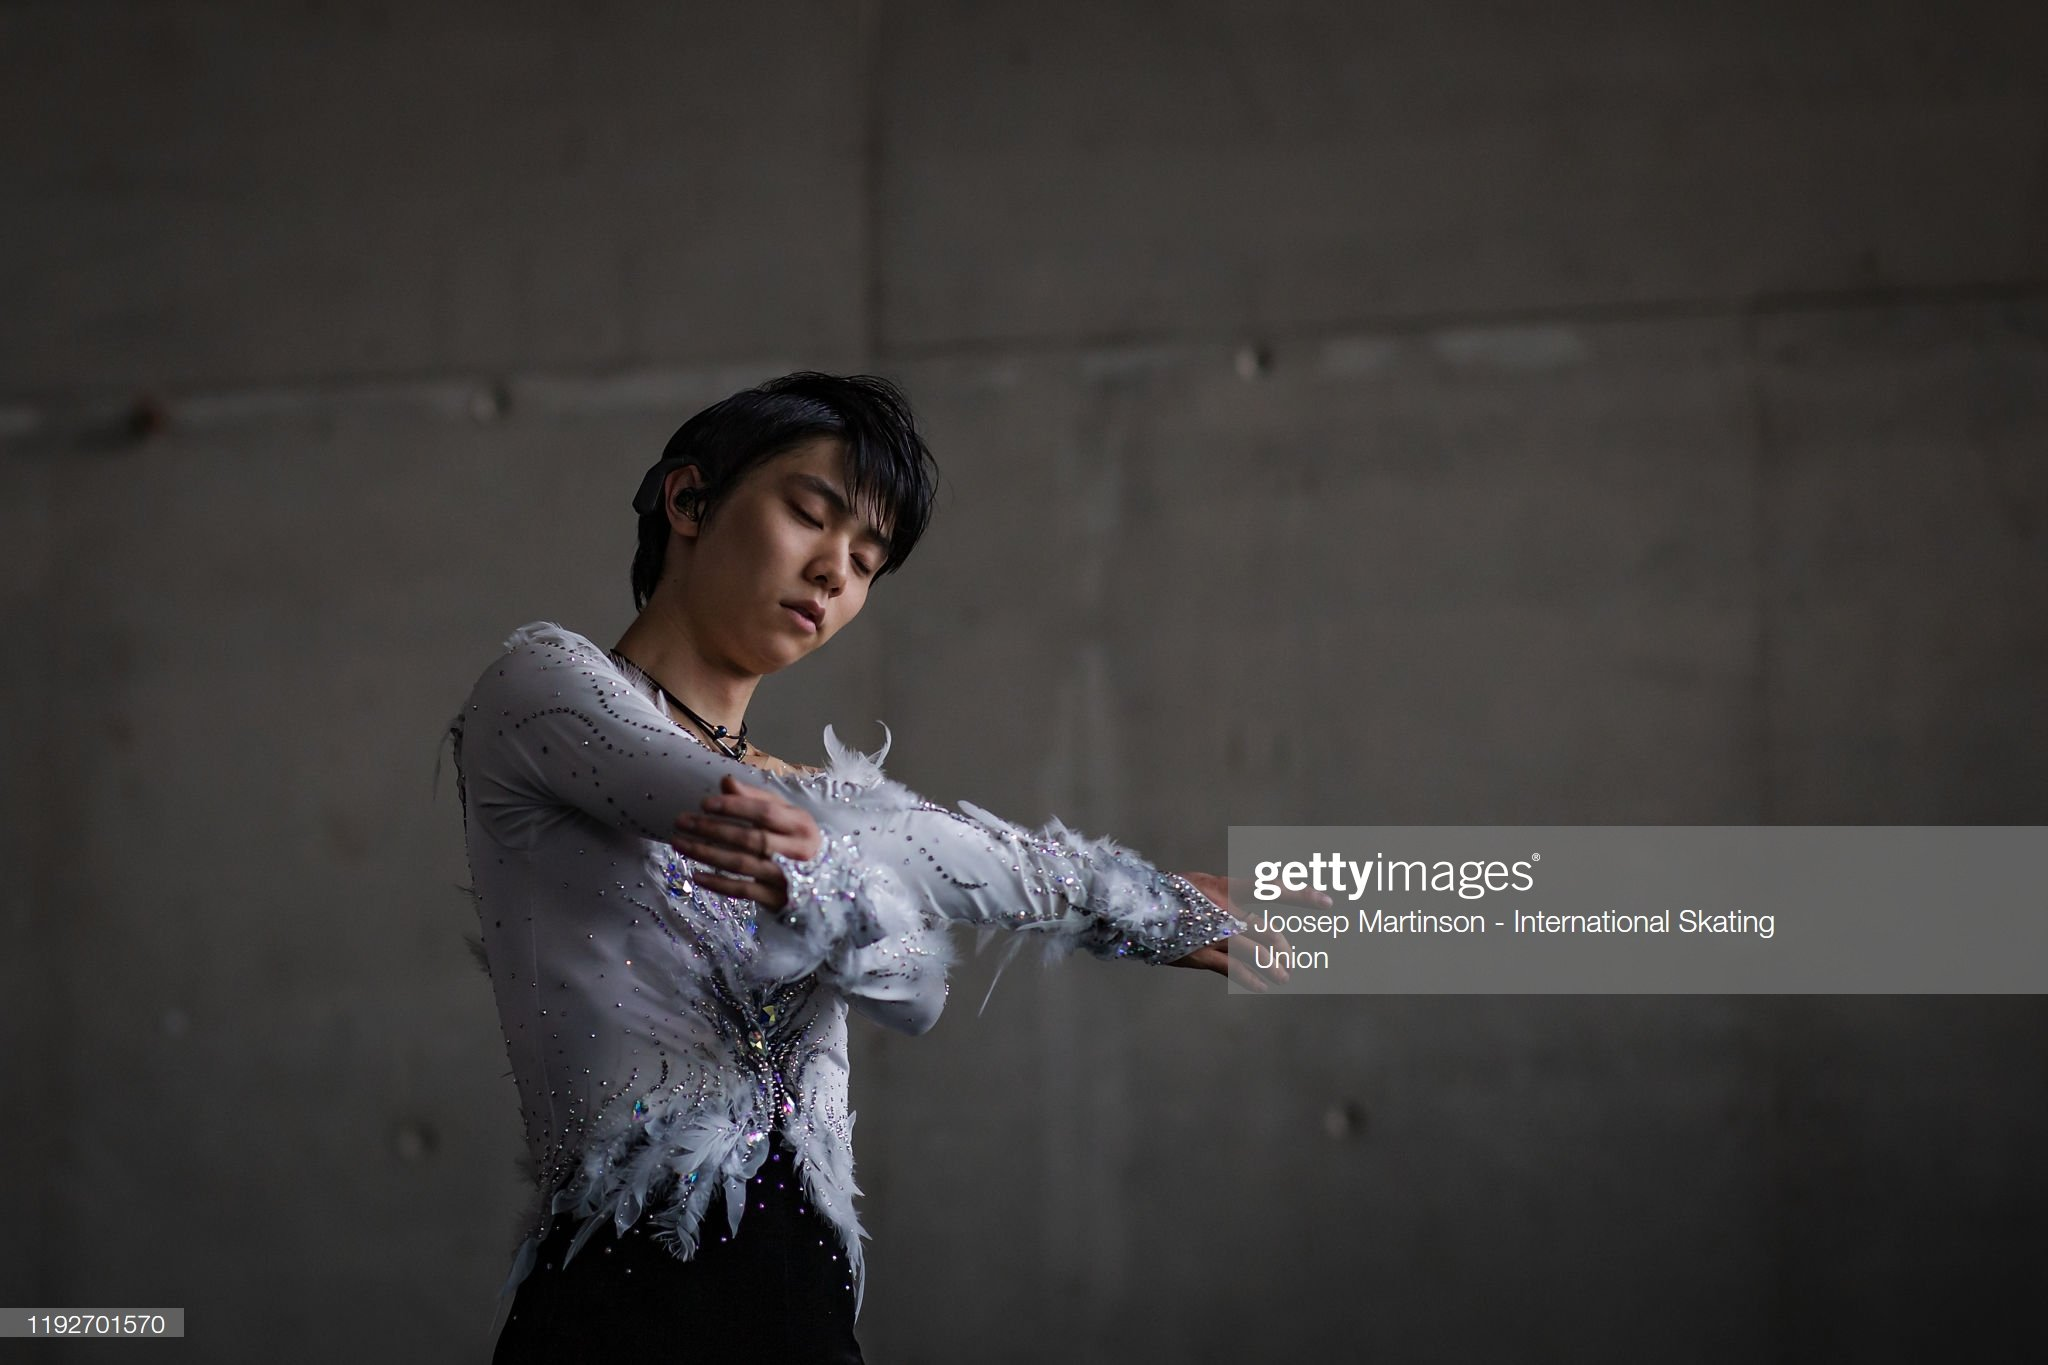 Юзуру Ханю / Yuzuru HANYU JPN - 2 - Страница 4 3be501ae011eab7ffd434acbf66fd